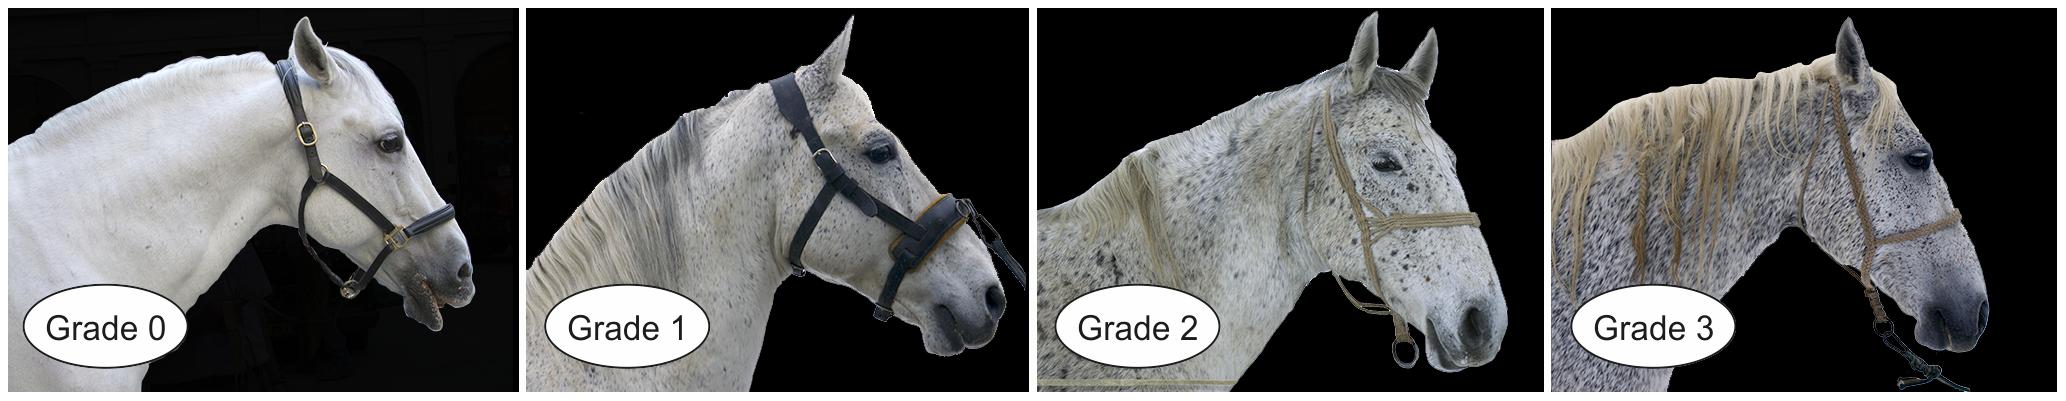 Variation of speckling grade in four grey Lipizzan horses.